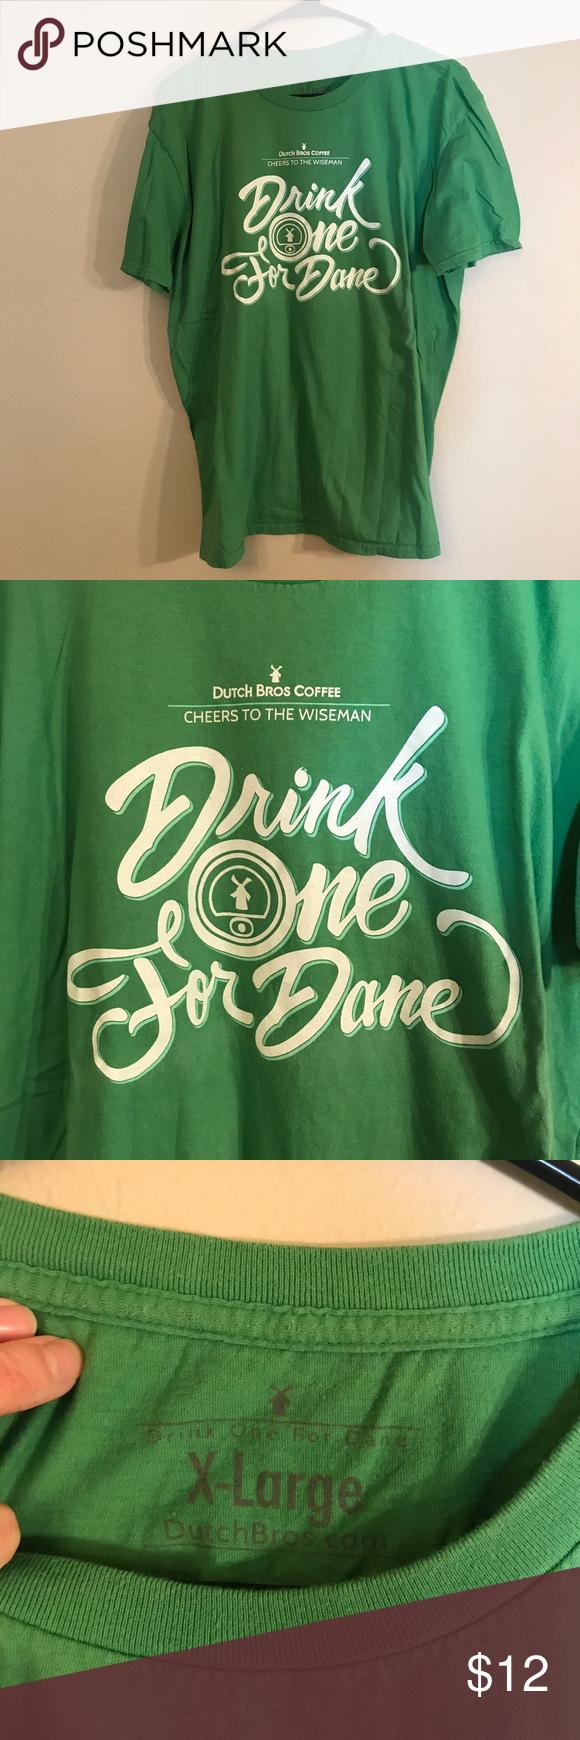 Green Dutch Bros Drink One For Dane Tee Excellent Condition! Dutch Bros Tops Tees - Short Sleeve #dutchbros Green Dutch Bros Drink One For Dane Tee Excellent Condition! Dutch Bros Tops Tees - Short Sleeve #dutchbros